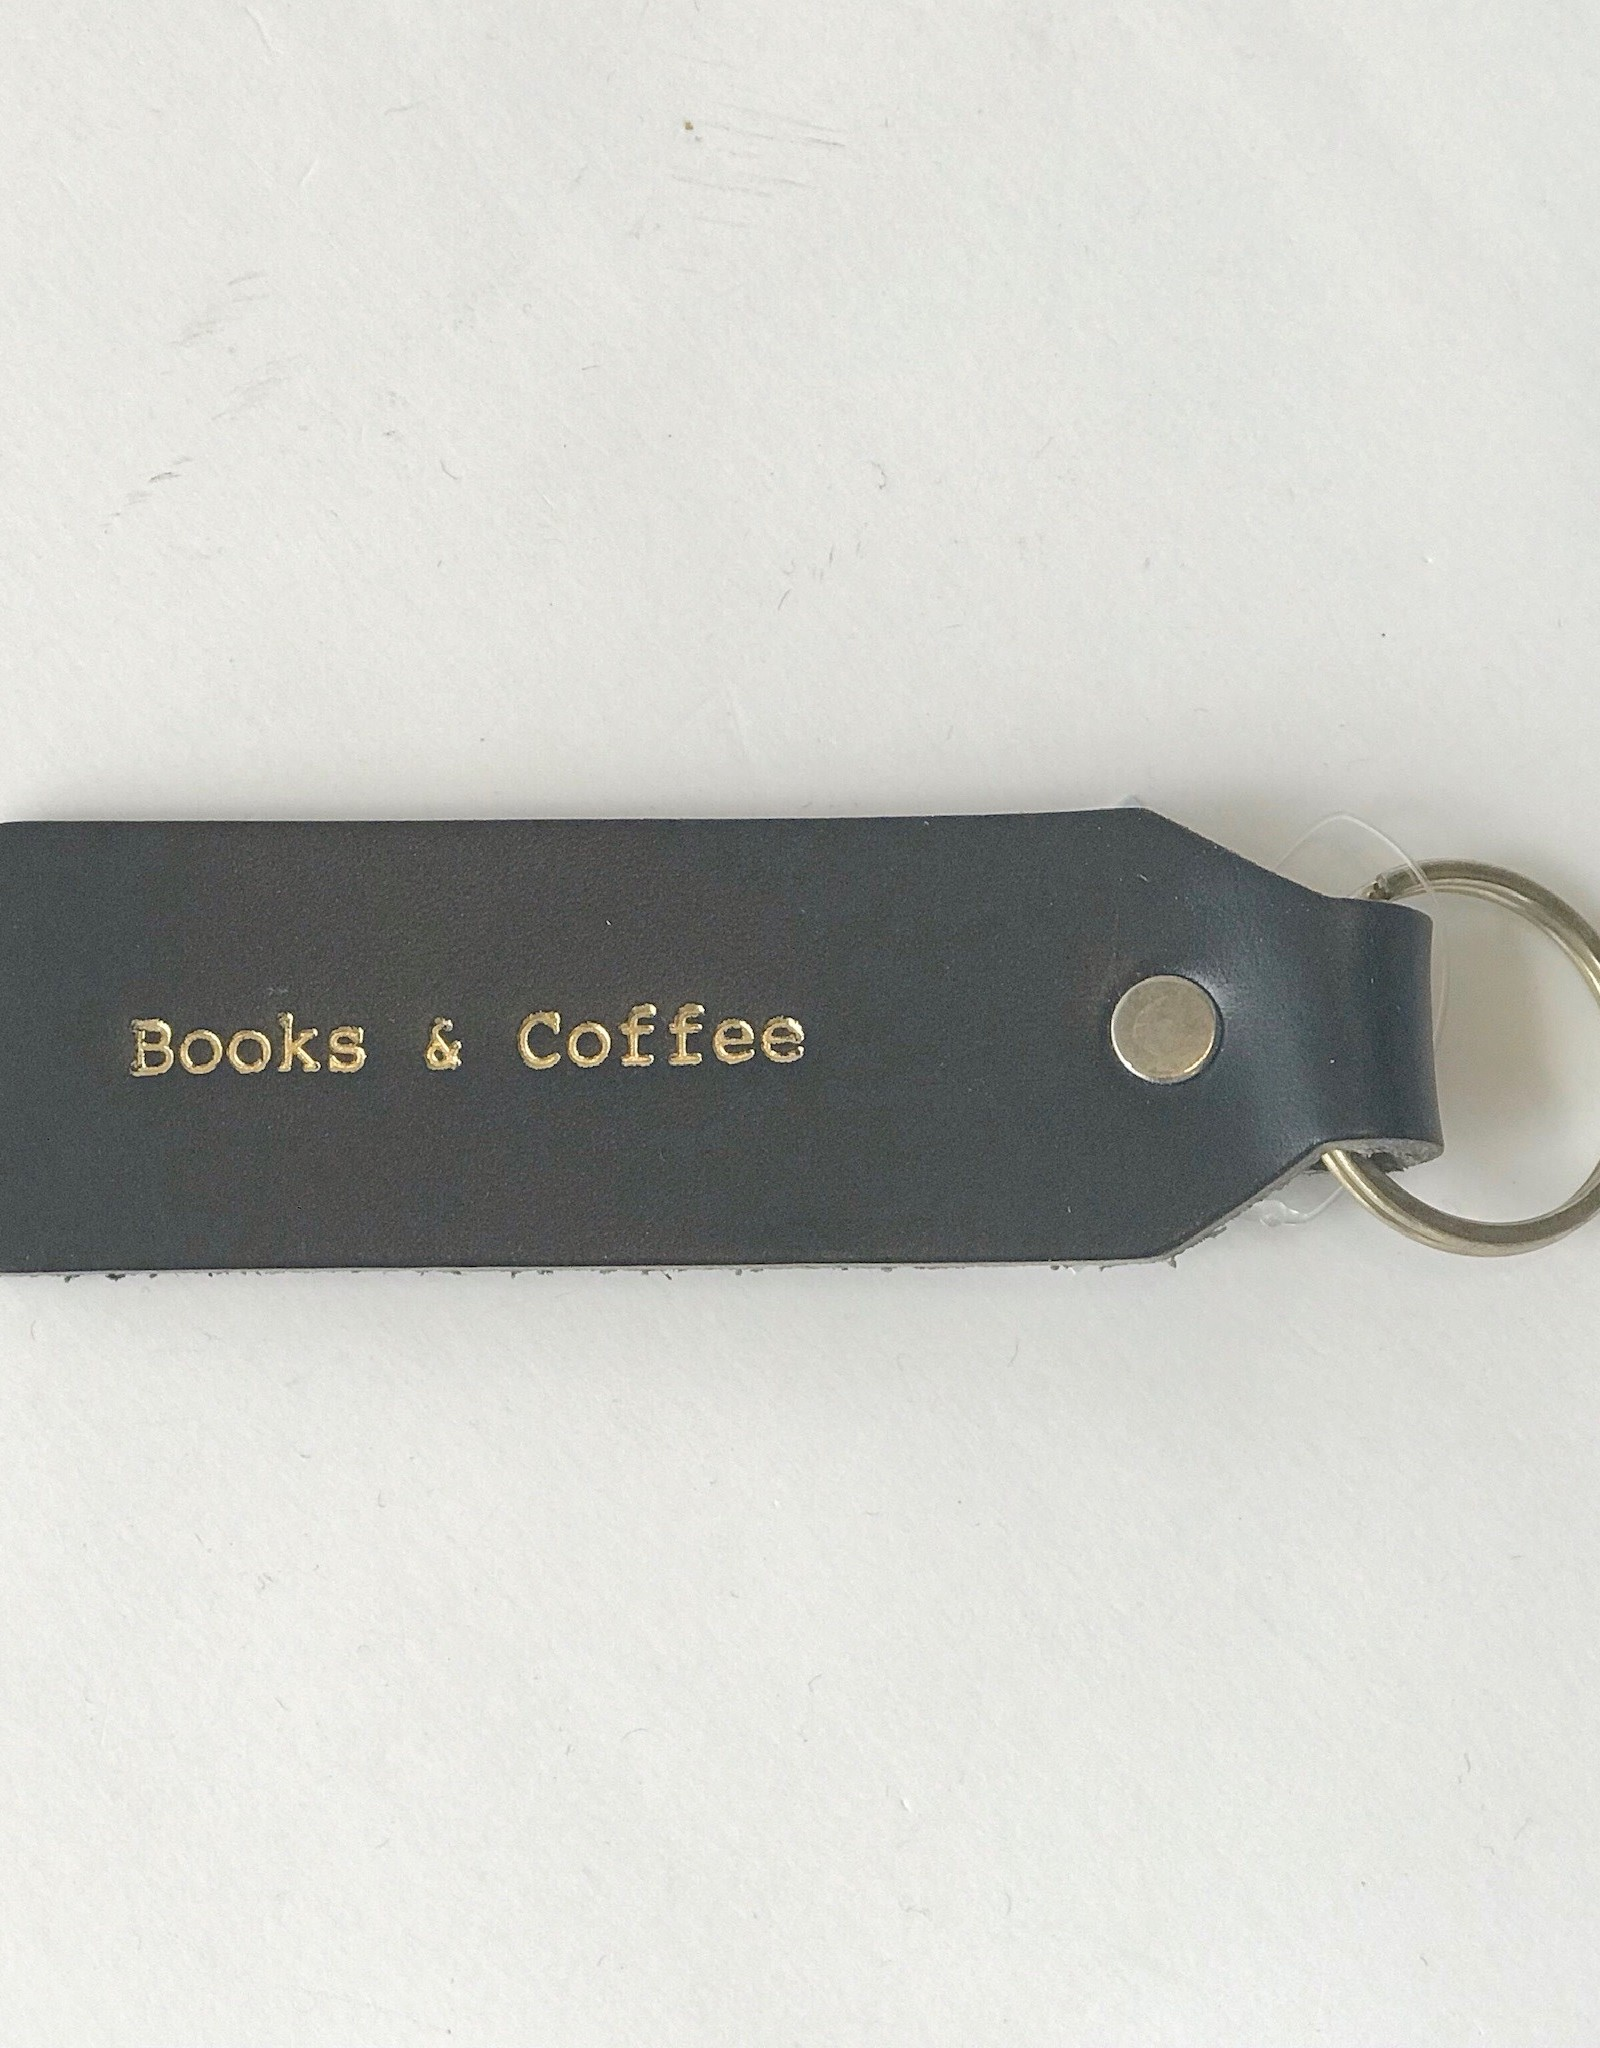 Books and Coffee Keychain